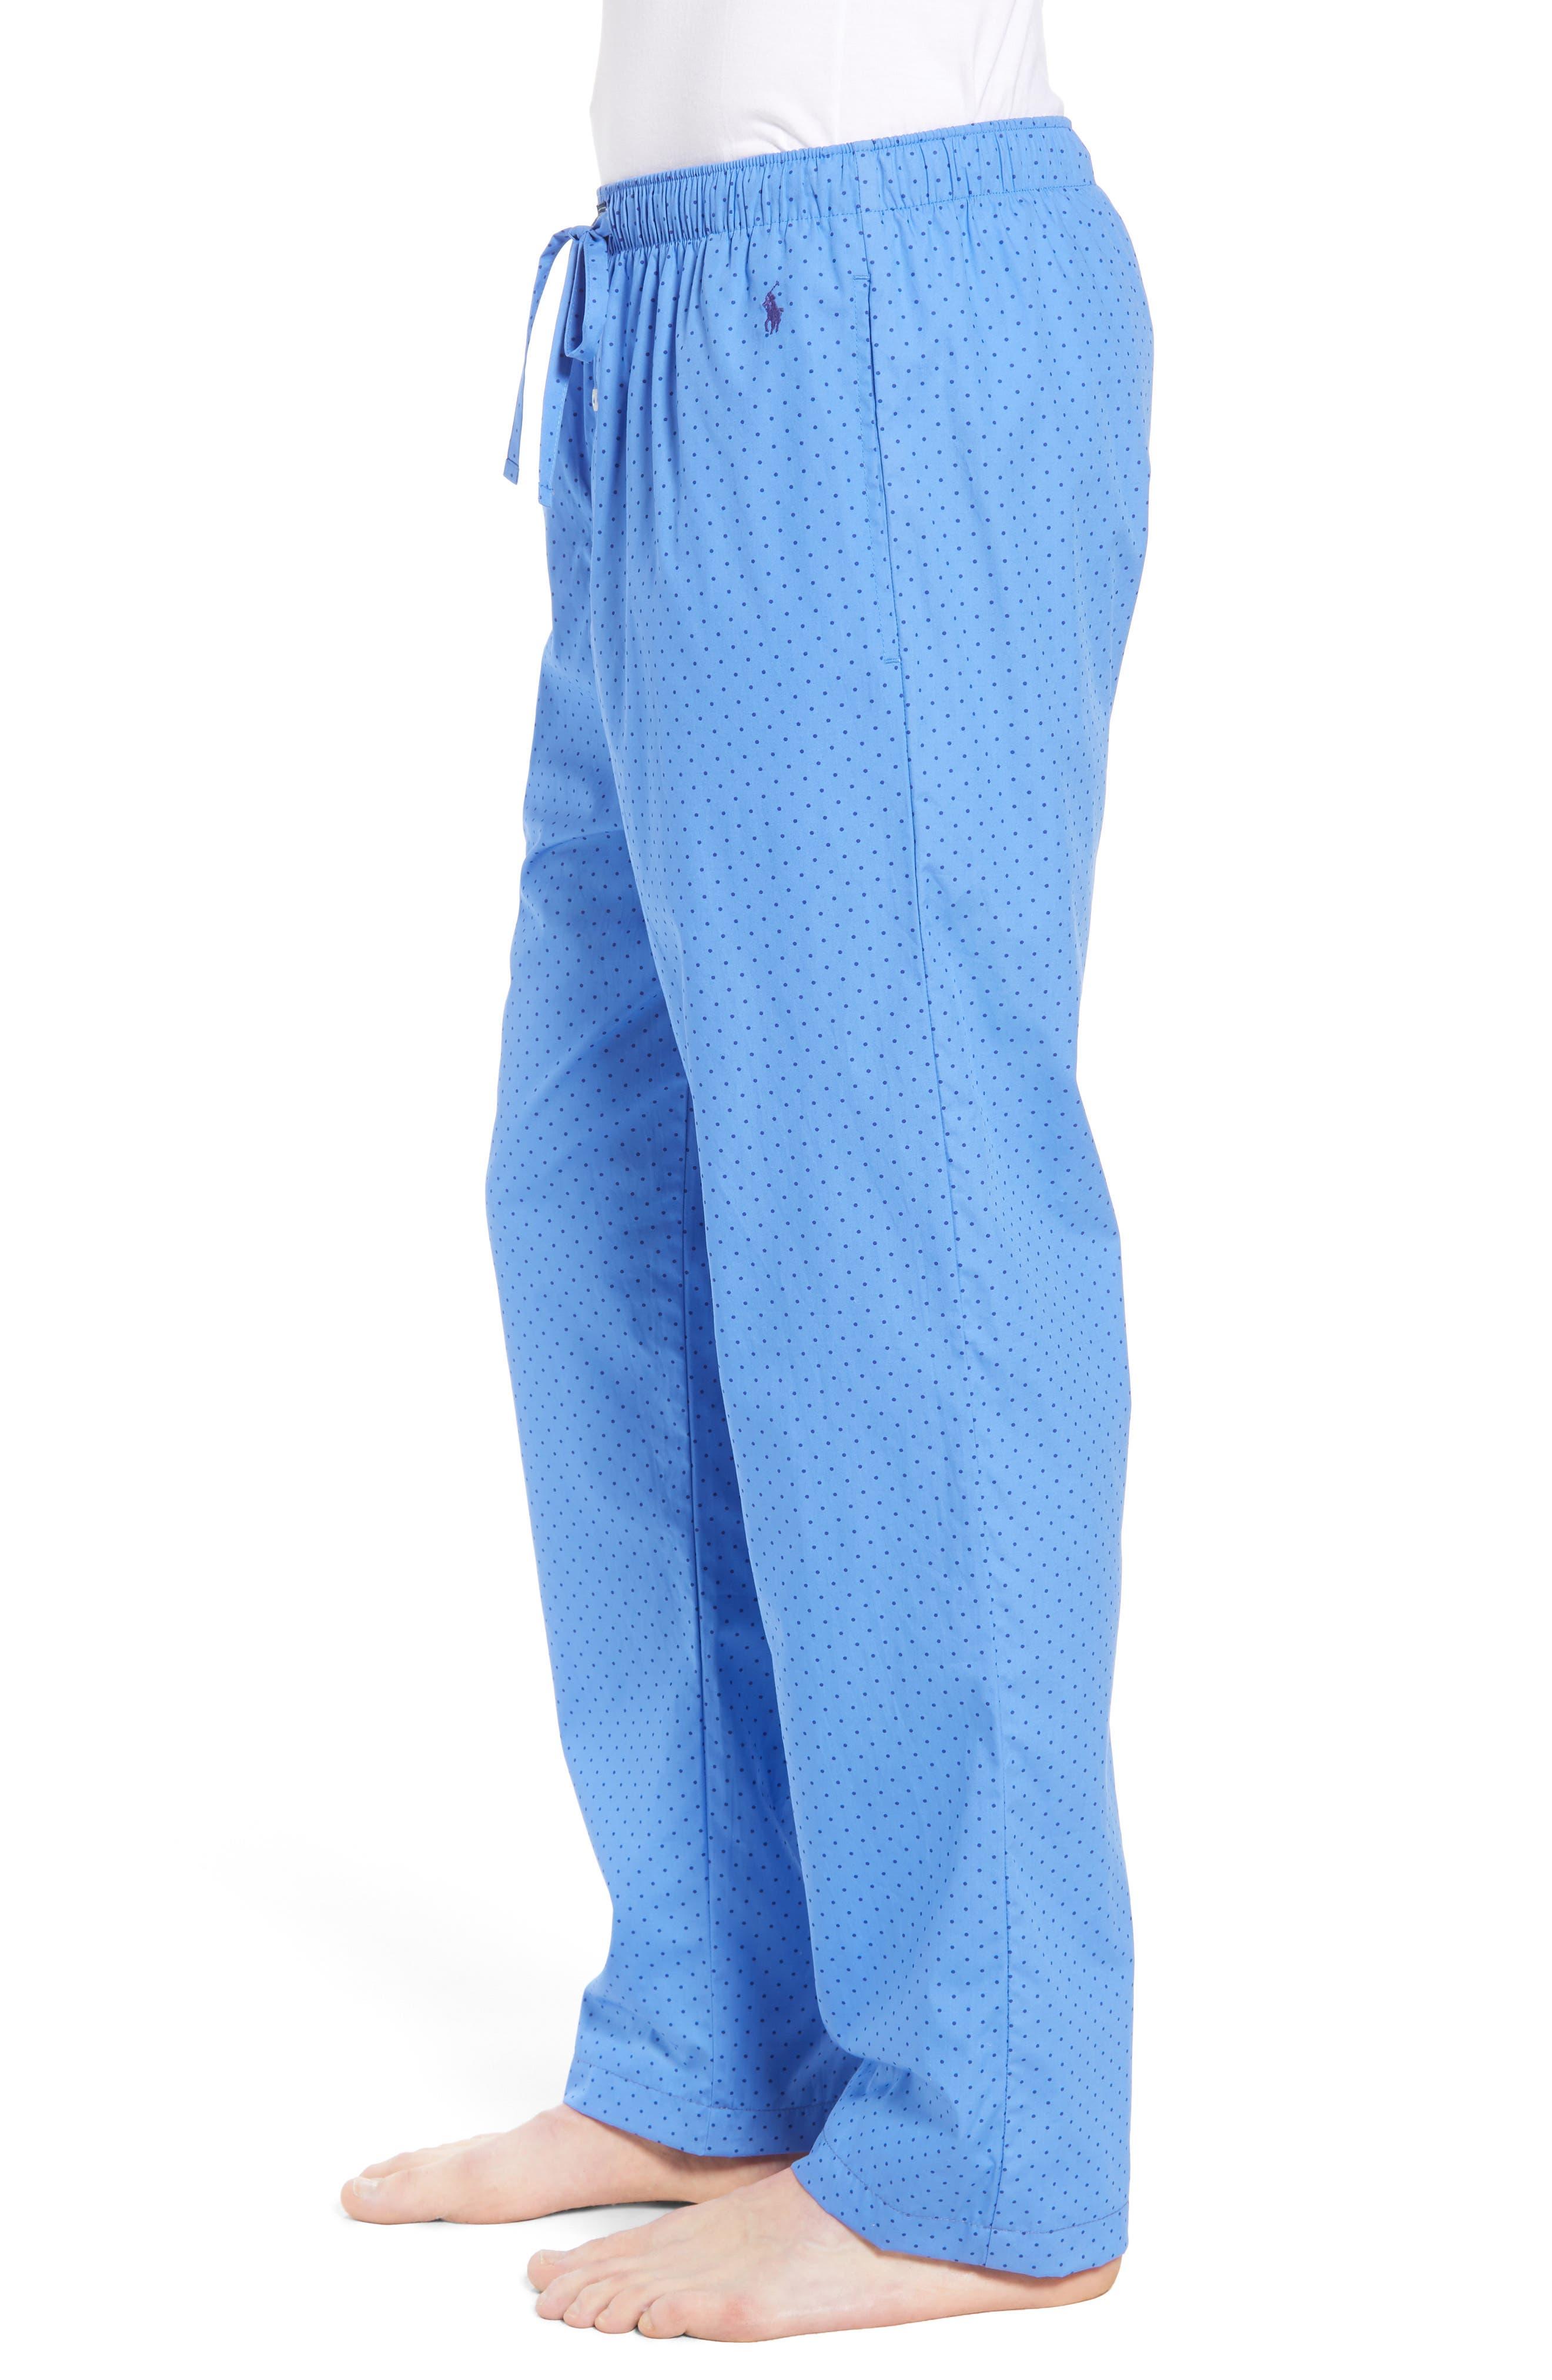 Dot Cotton Pajama Pants,                             Alternate thumbnail 3, color,                             451